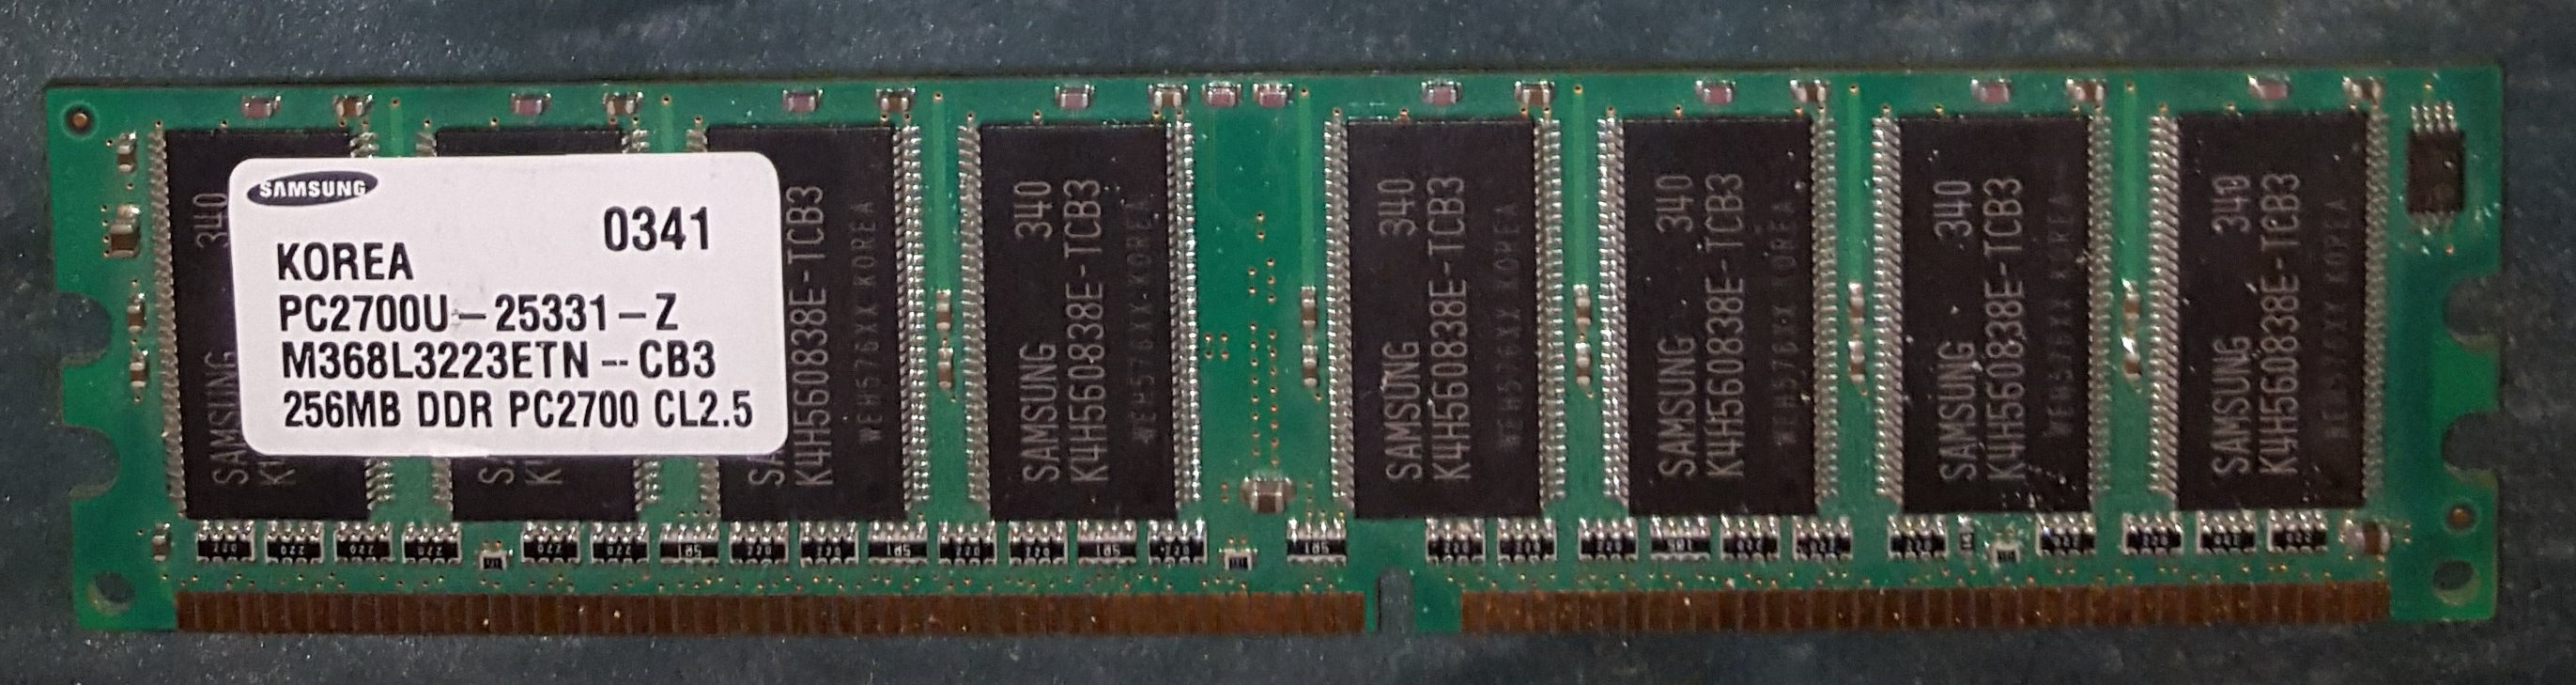 Samsung 256 Mb DDR 333 Mhz PC2700U-25331-Z M368L3223ETN-CB3 CL2.5 DIMM – Occasion